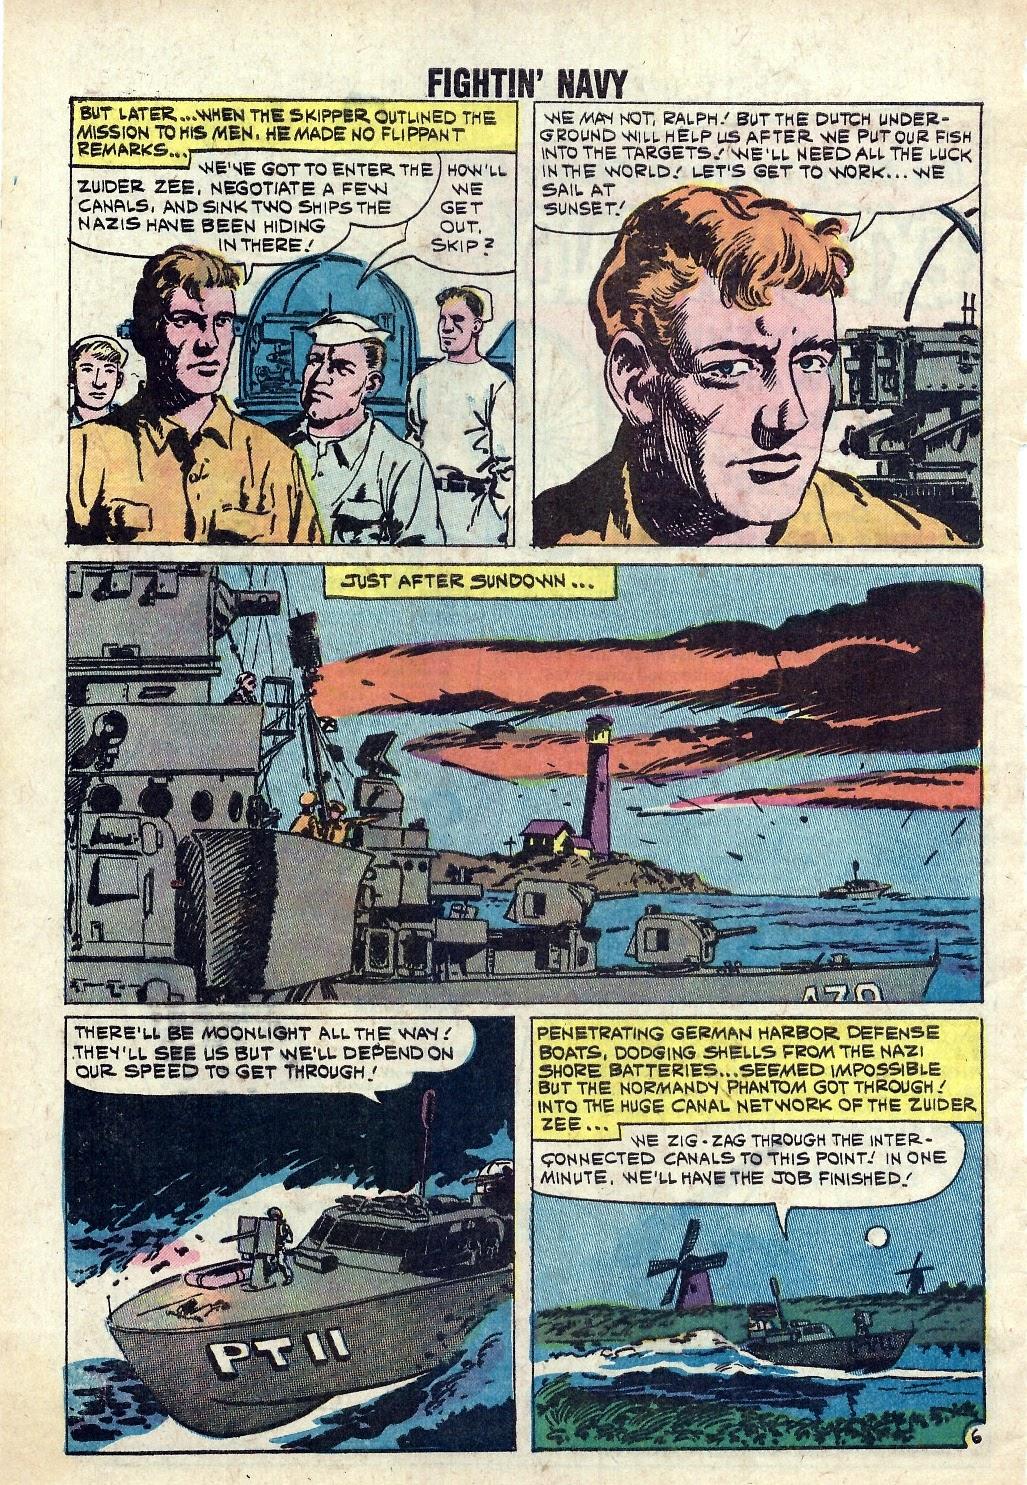 Read online Fightin' Navy comic -  Issue #94 - 32